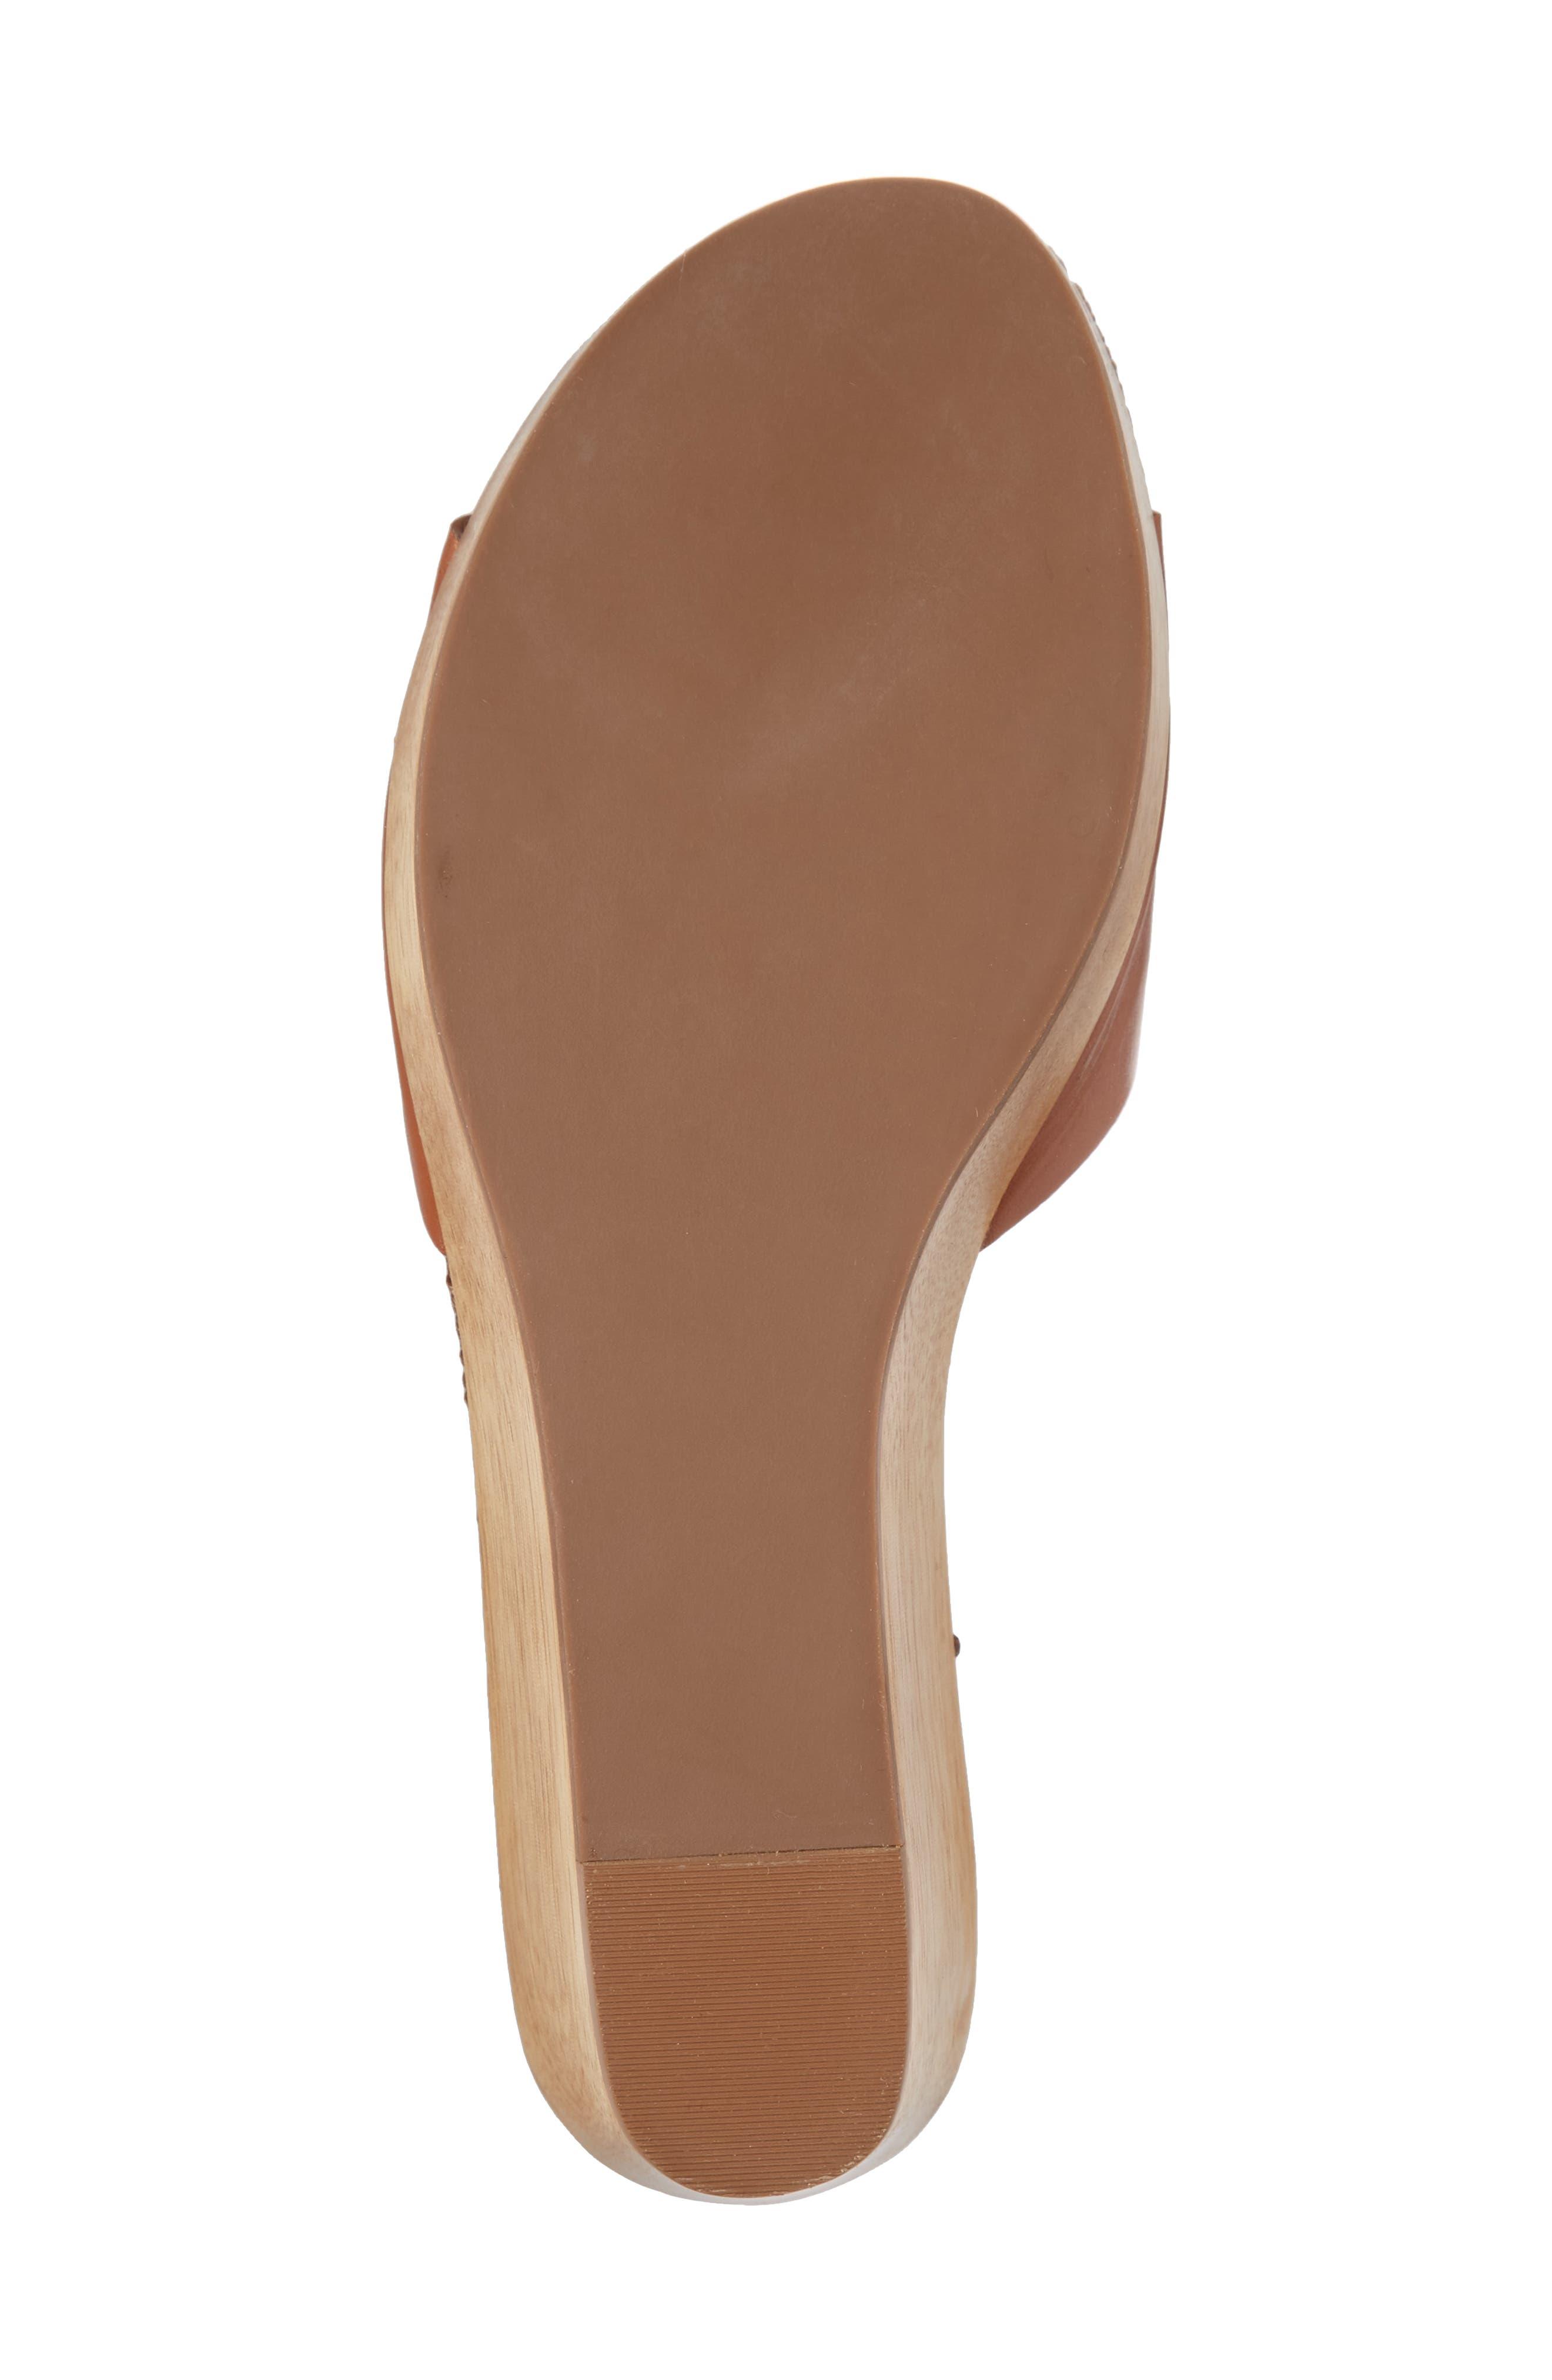 Patty Logo Platform Wedge Sandal,                             Alternate thumbnail 6, color,                             Perfect Cuoio